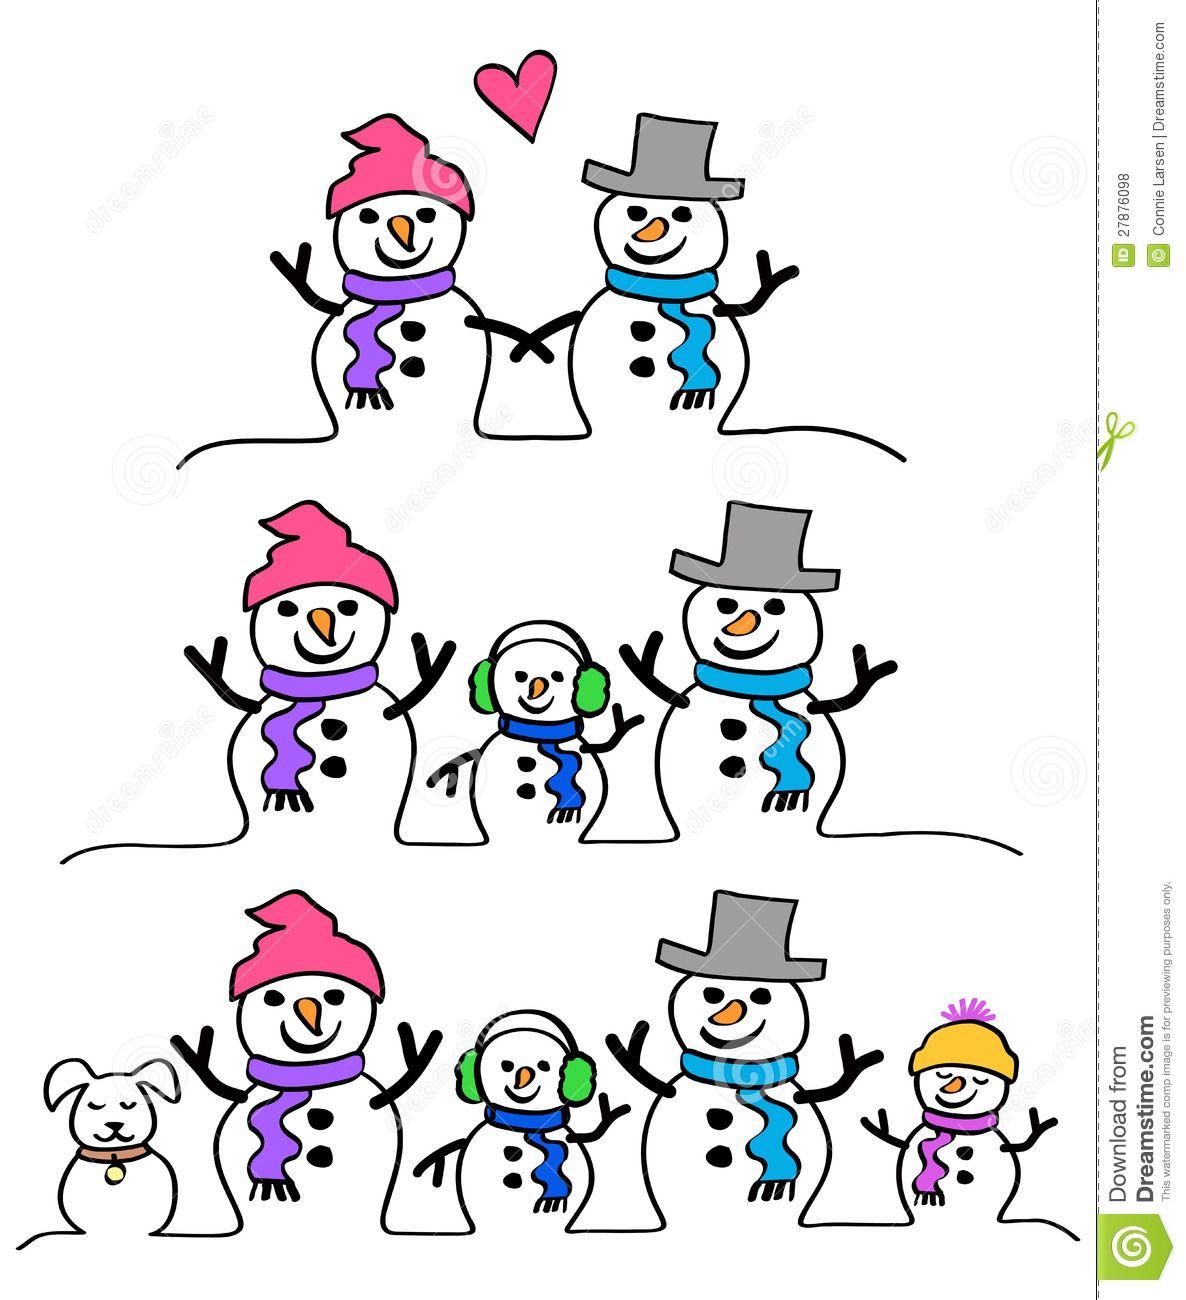 Snowman clipart snowman family Collection Stock Igloo & Snowman